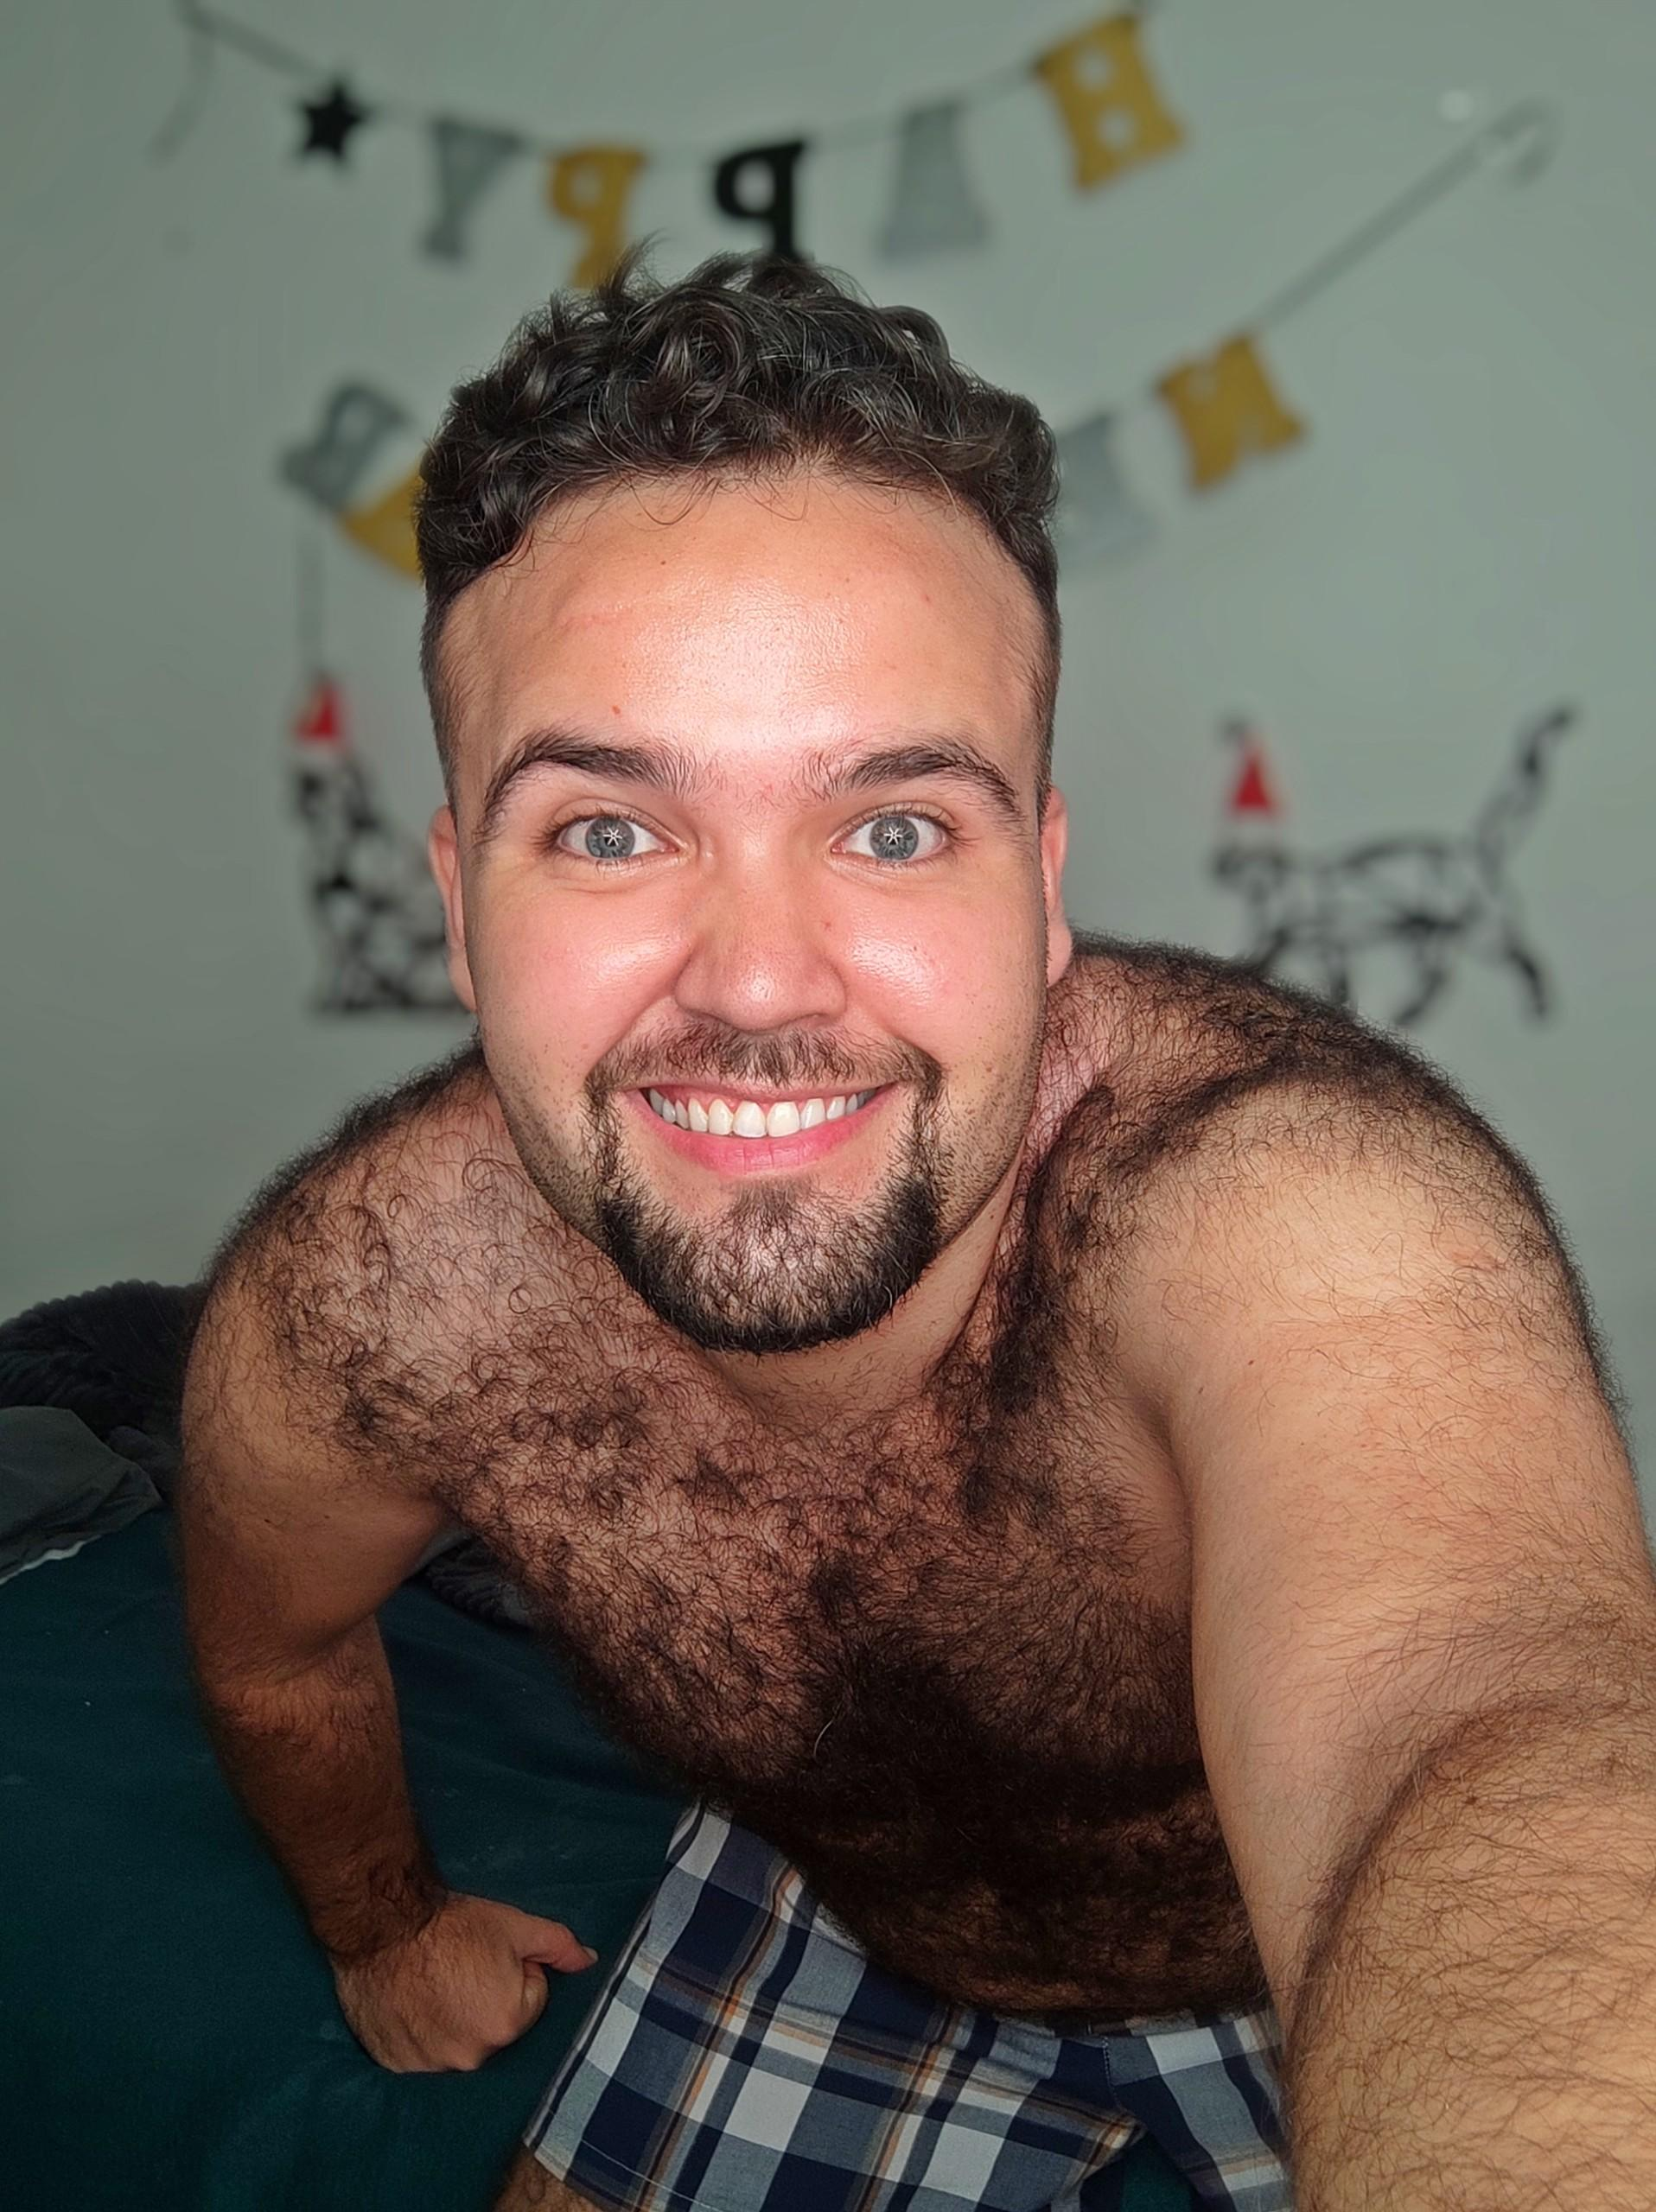 Werewolfm?s=umzubximhveh1mqcoiuxxjwryqxpnfq768fmtrstqzu=